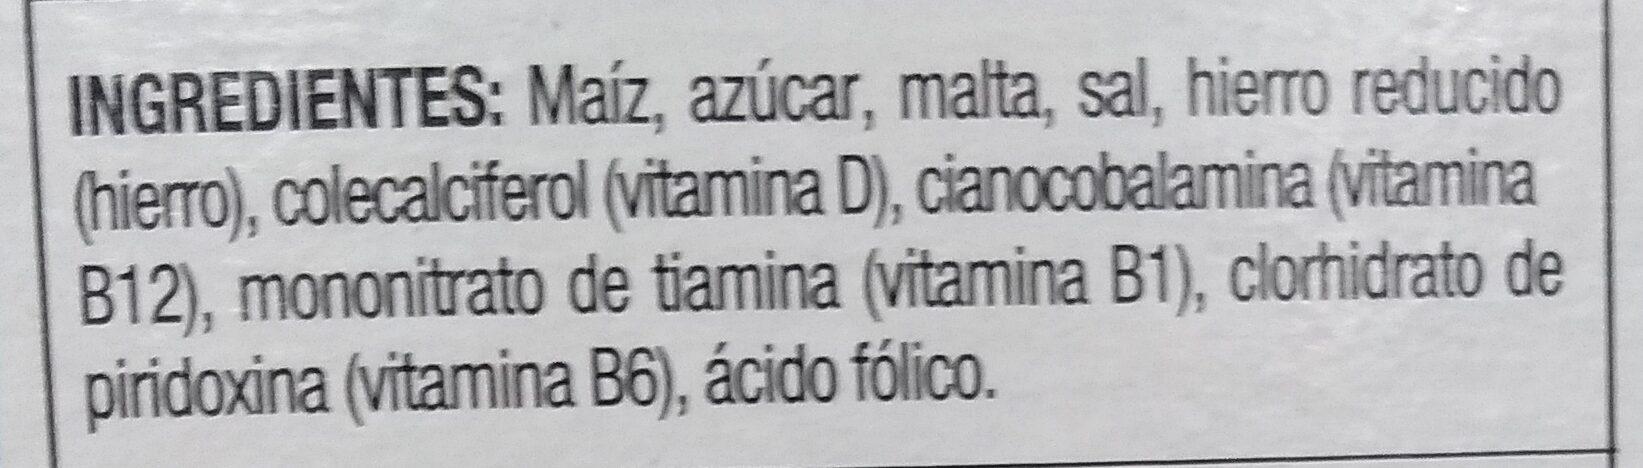 Zucaritas - Ingrédients